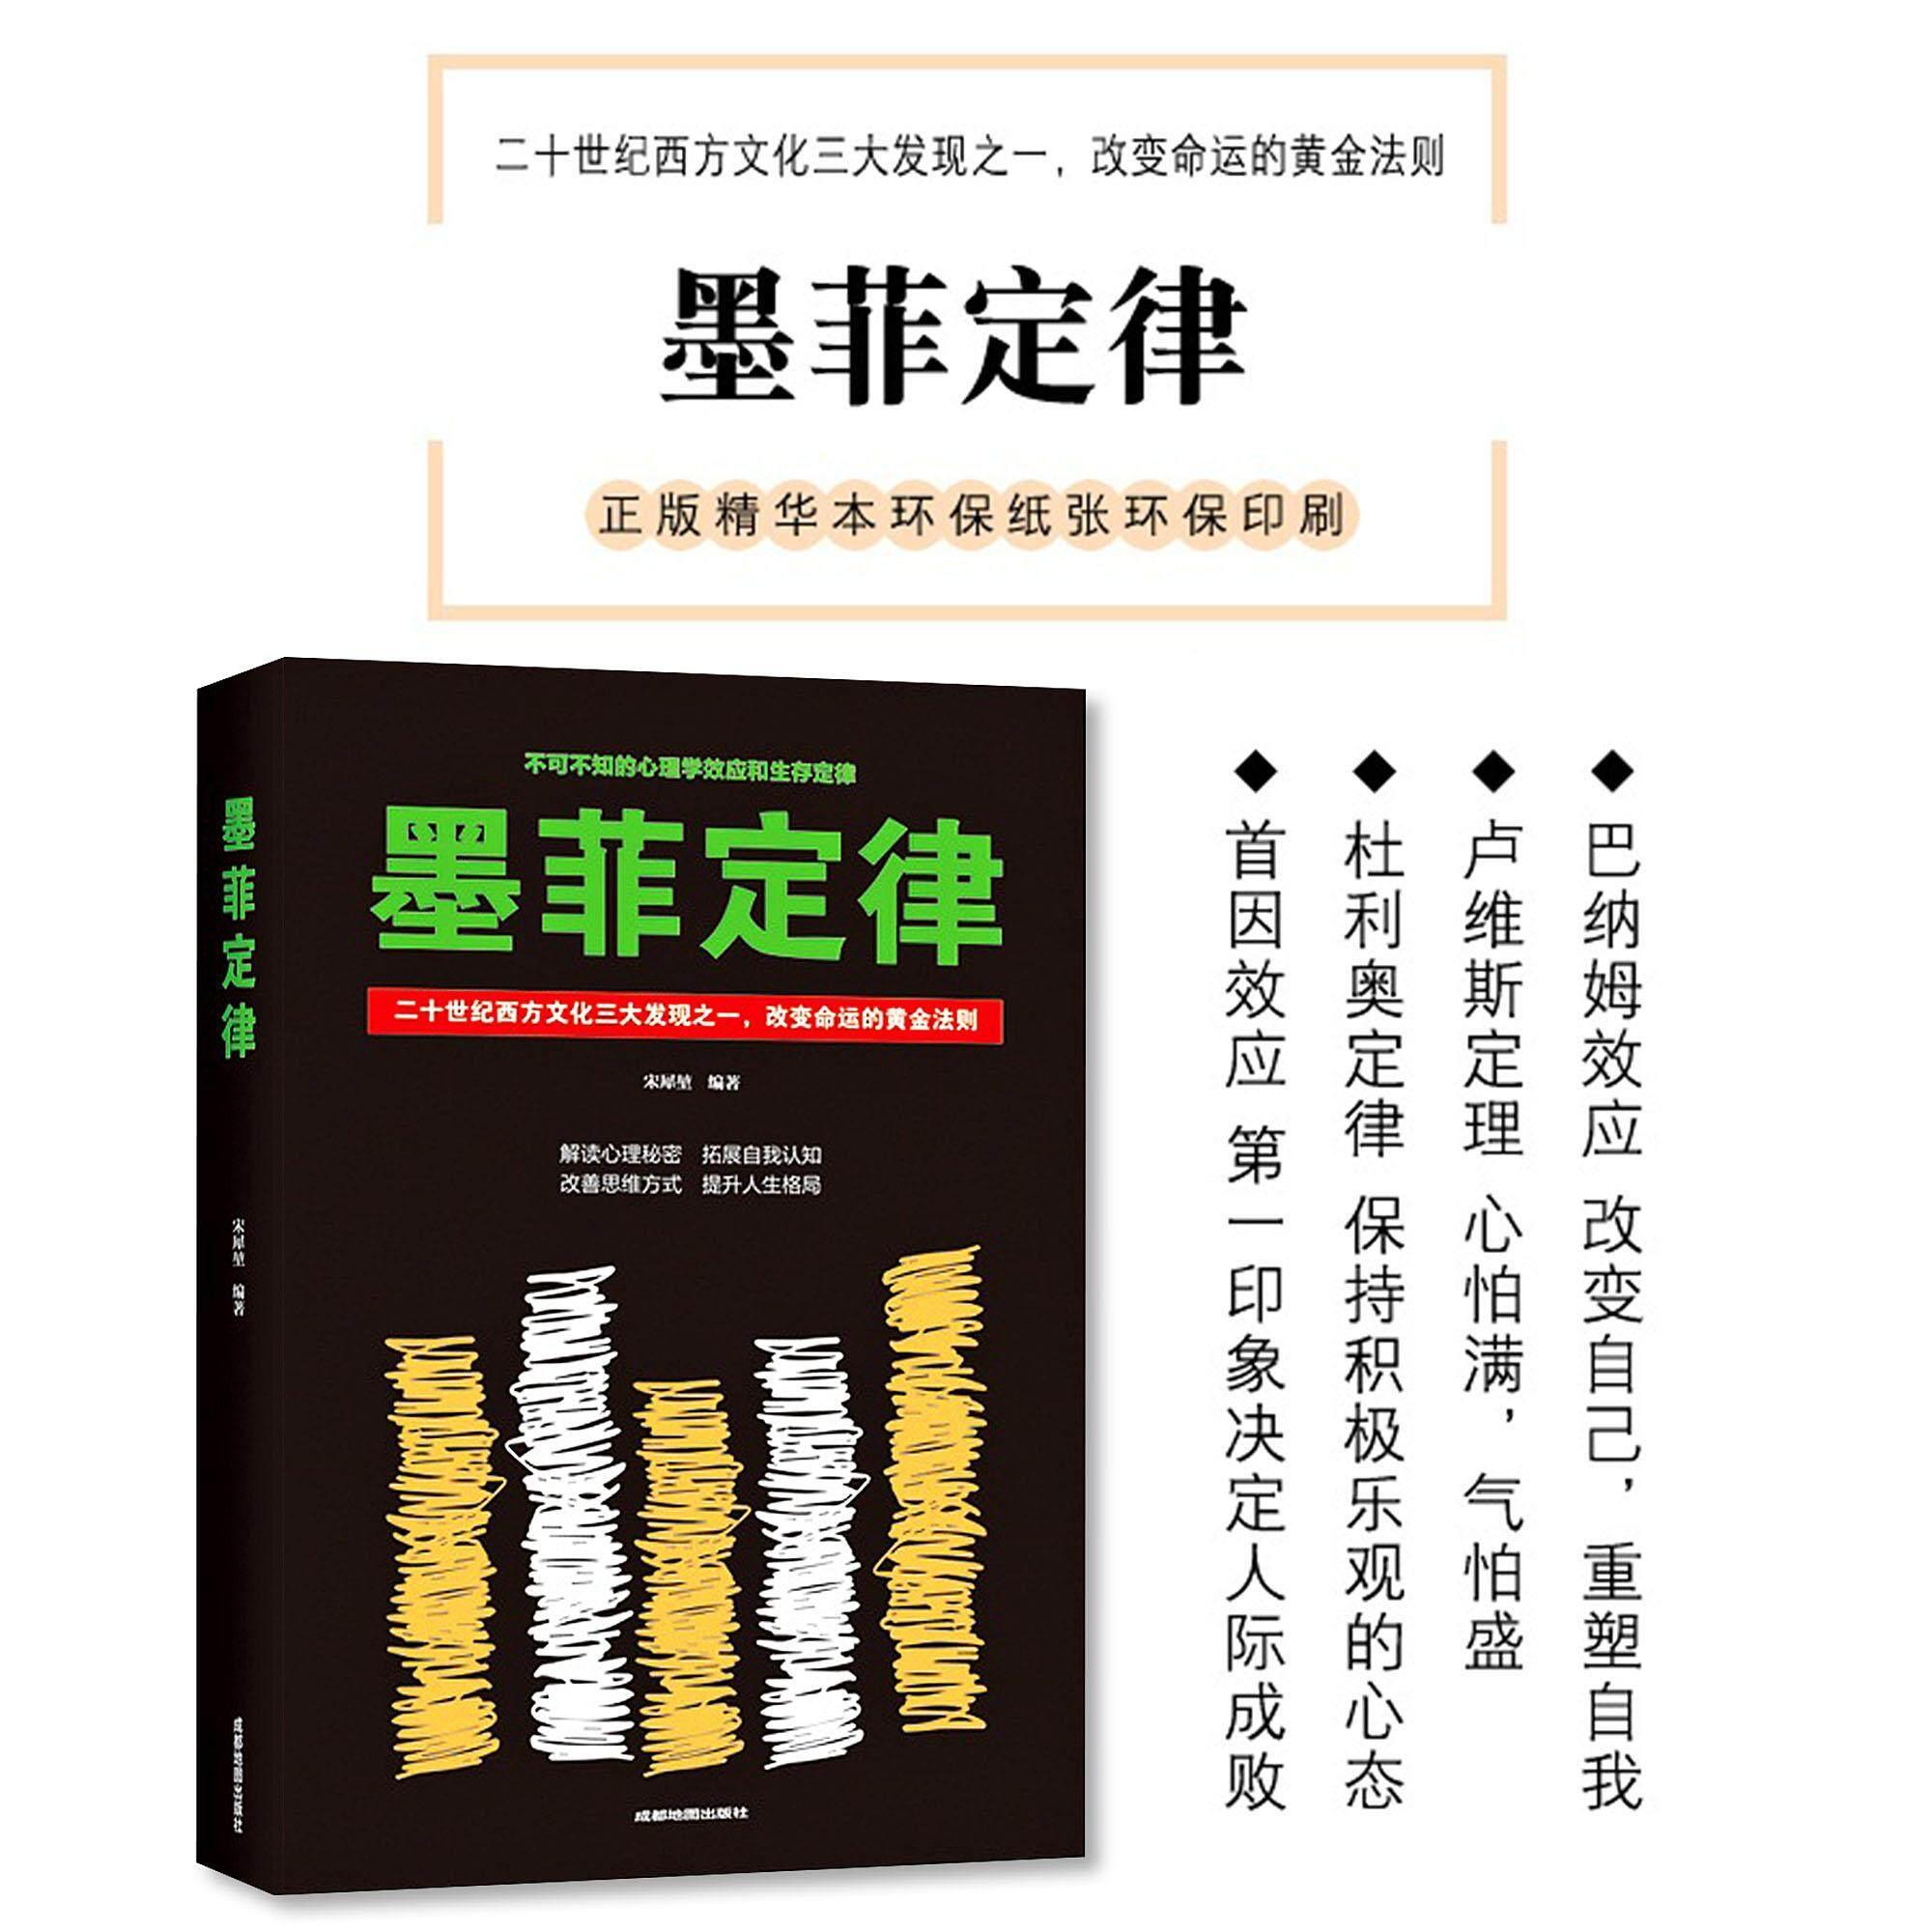 EQ 2 Books_Series 13 (+)